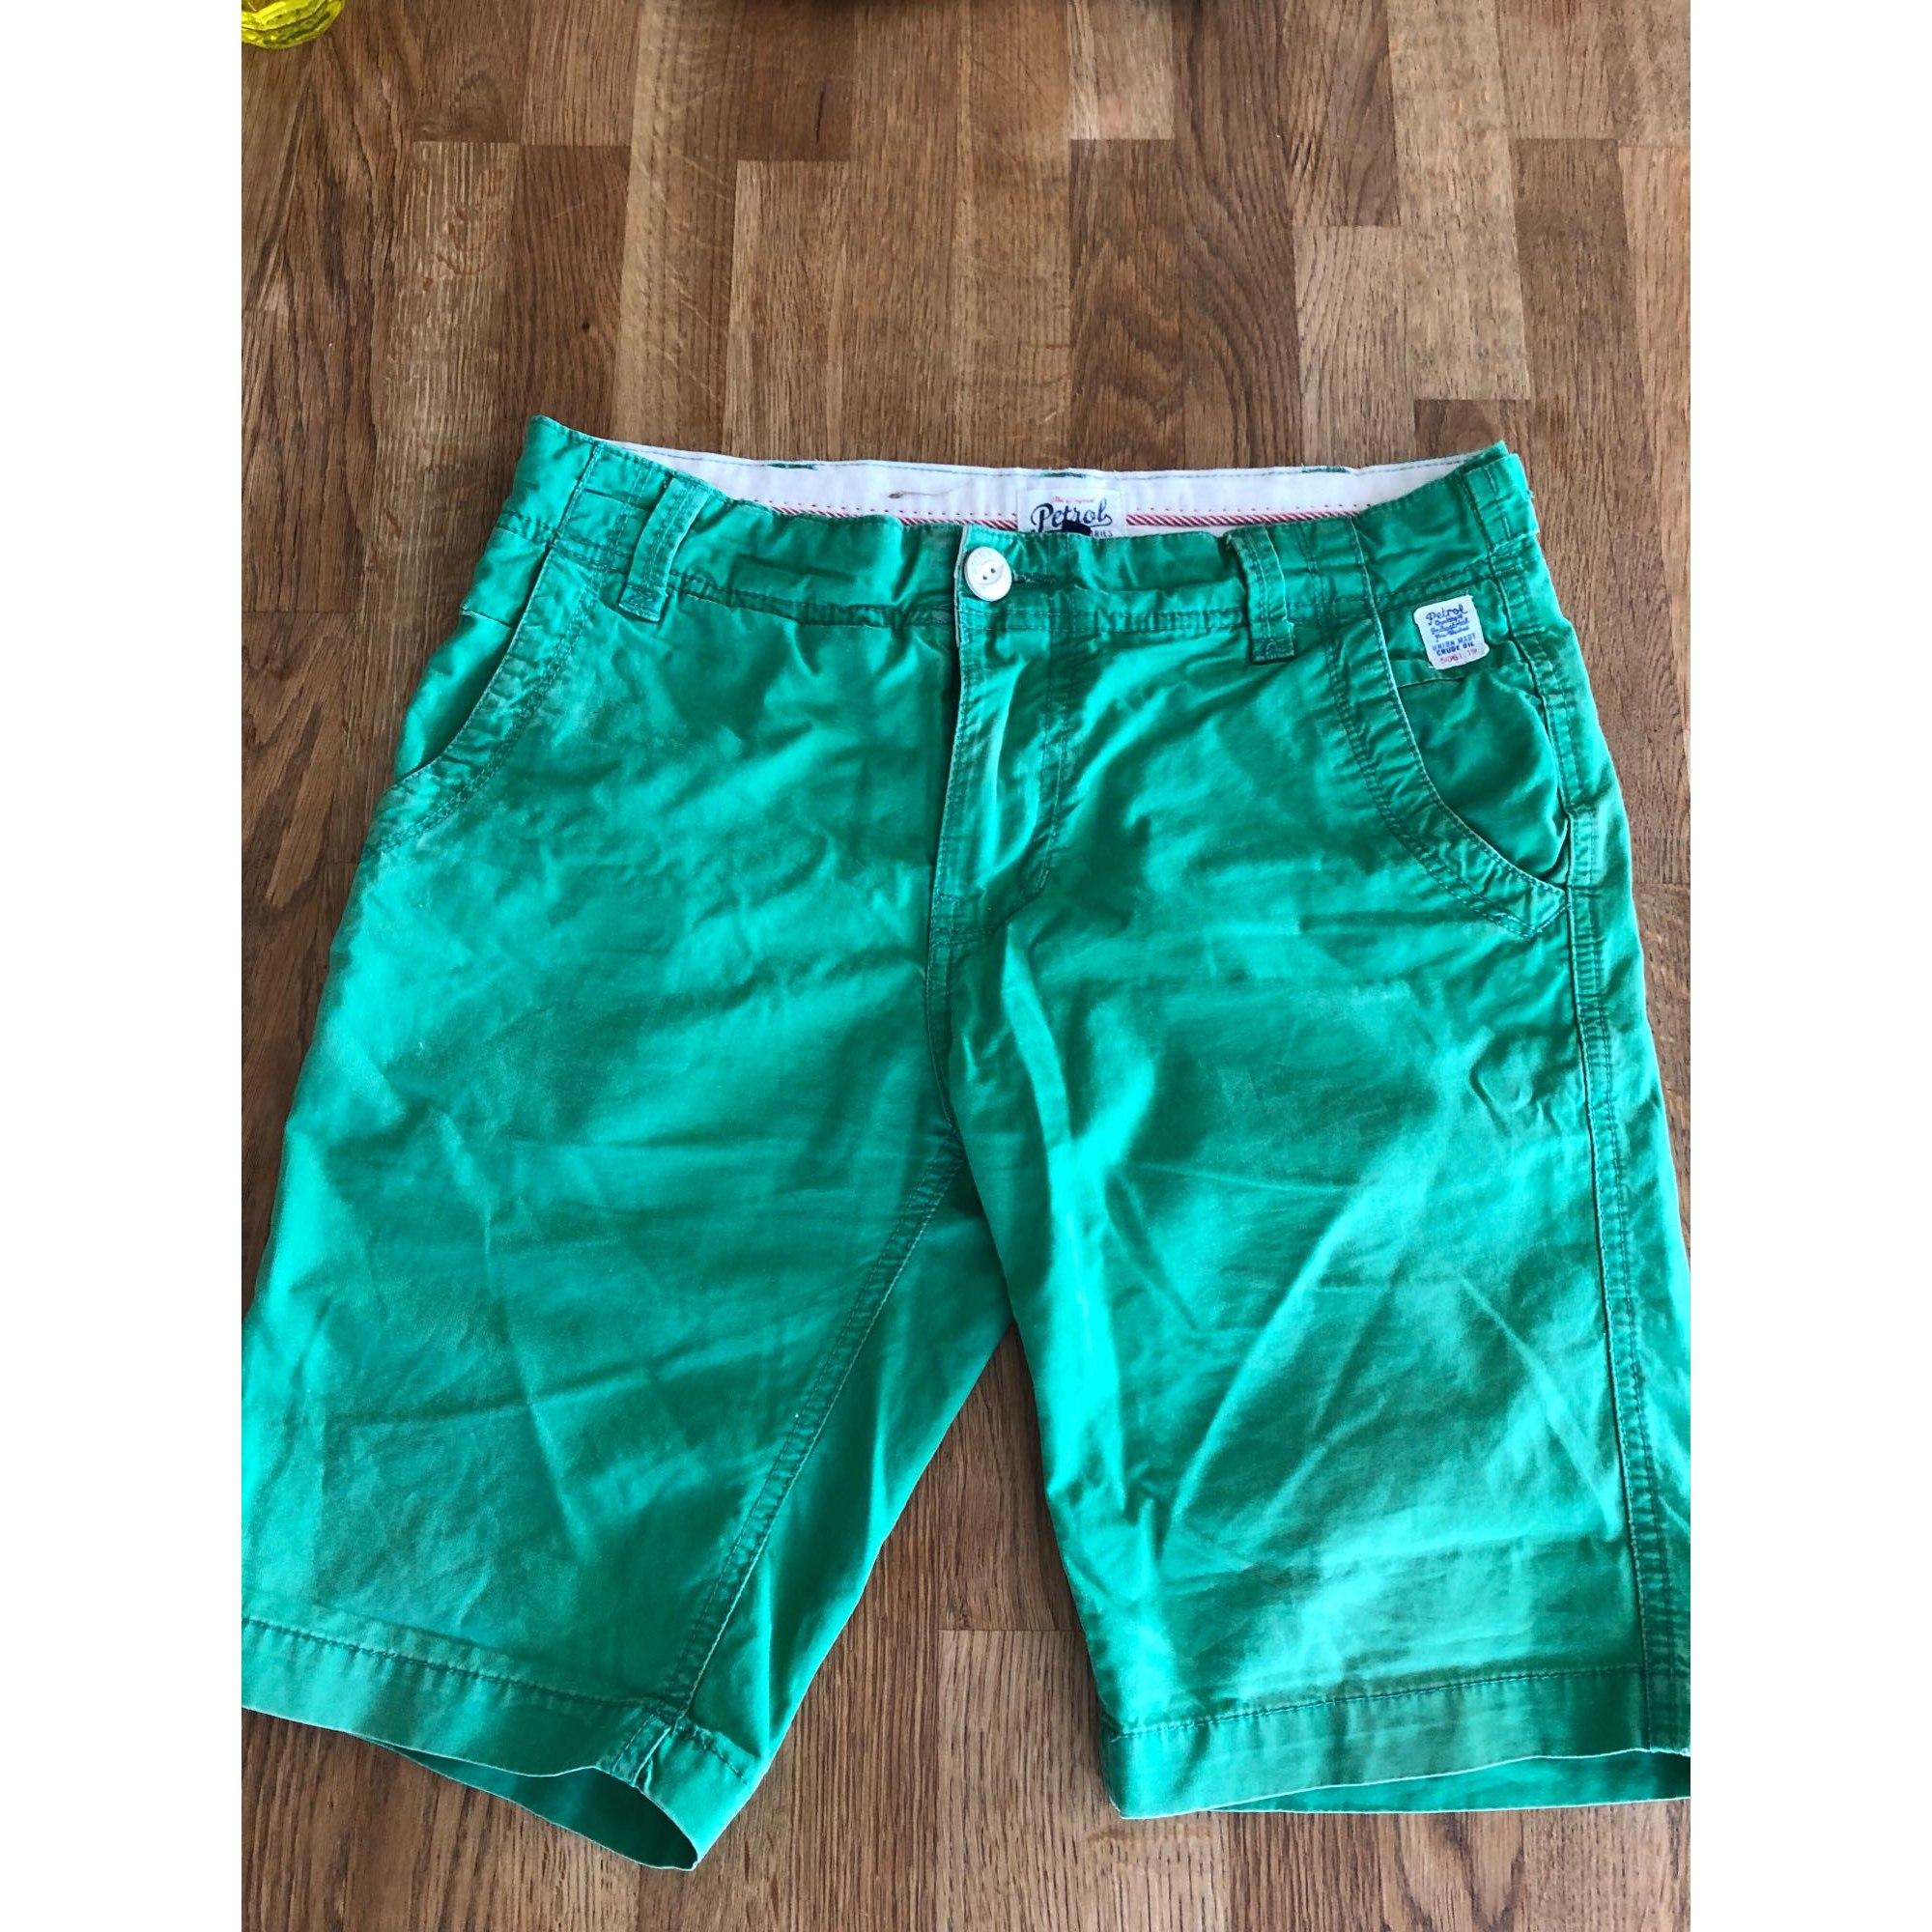 Bermuda Shorts PETROL INDUSTRIES Green